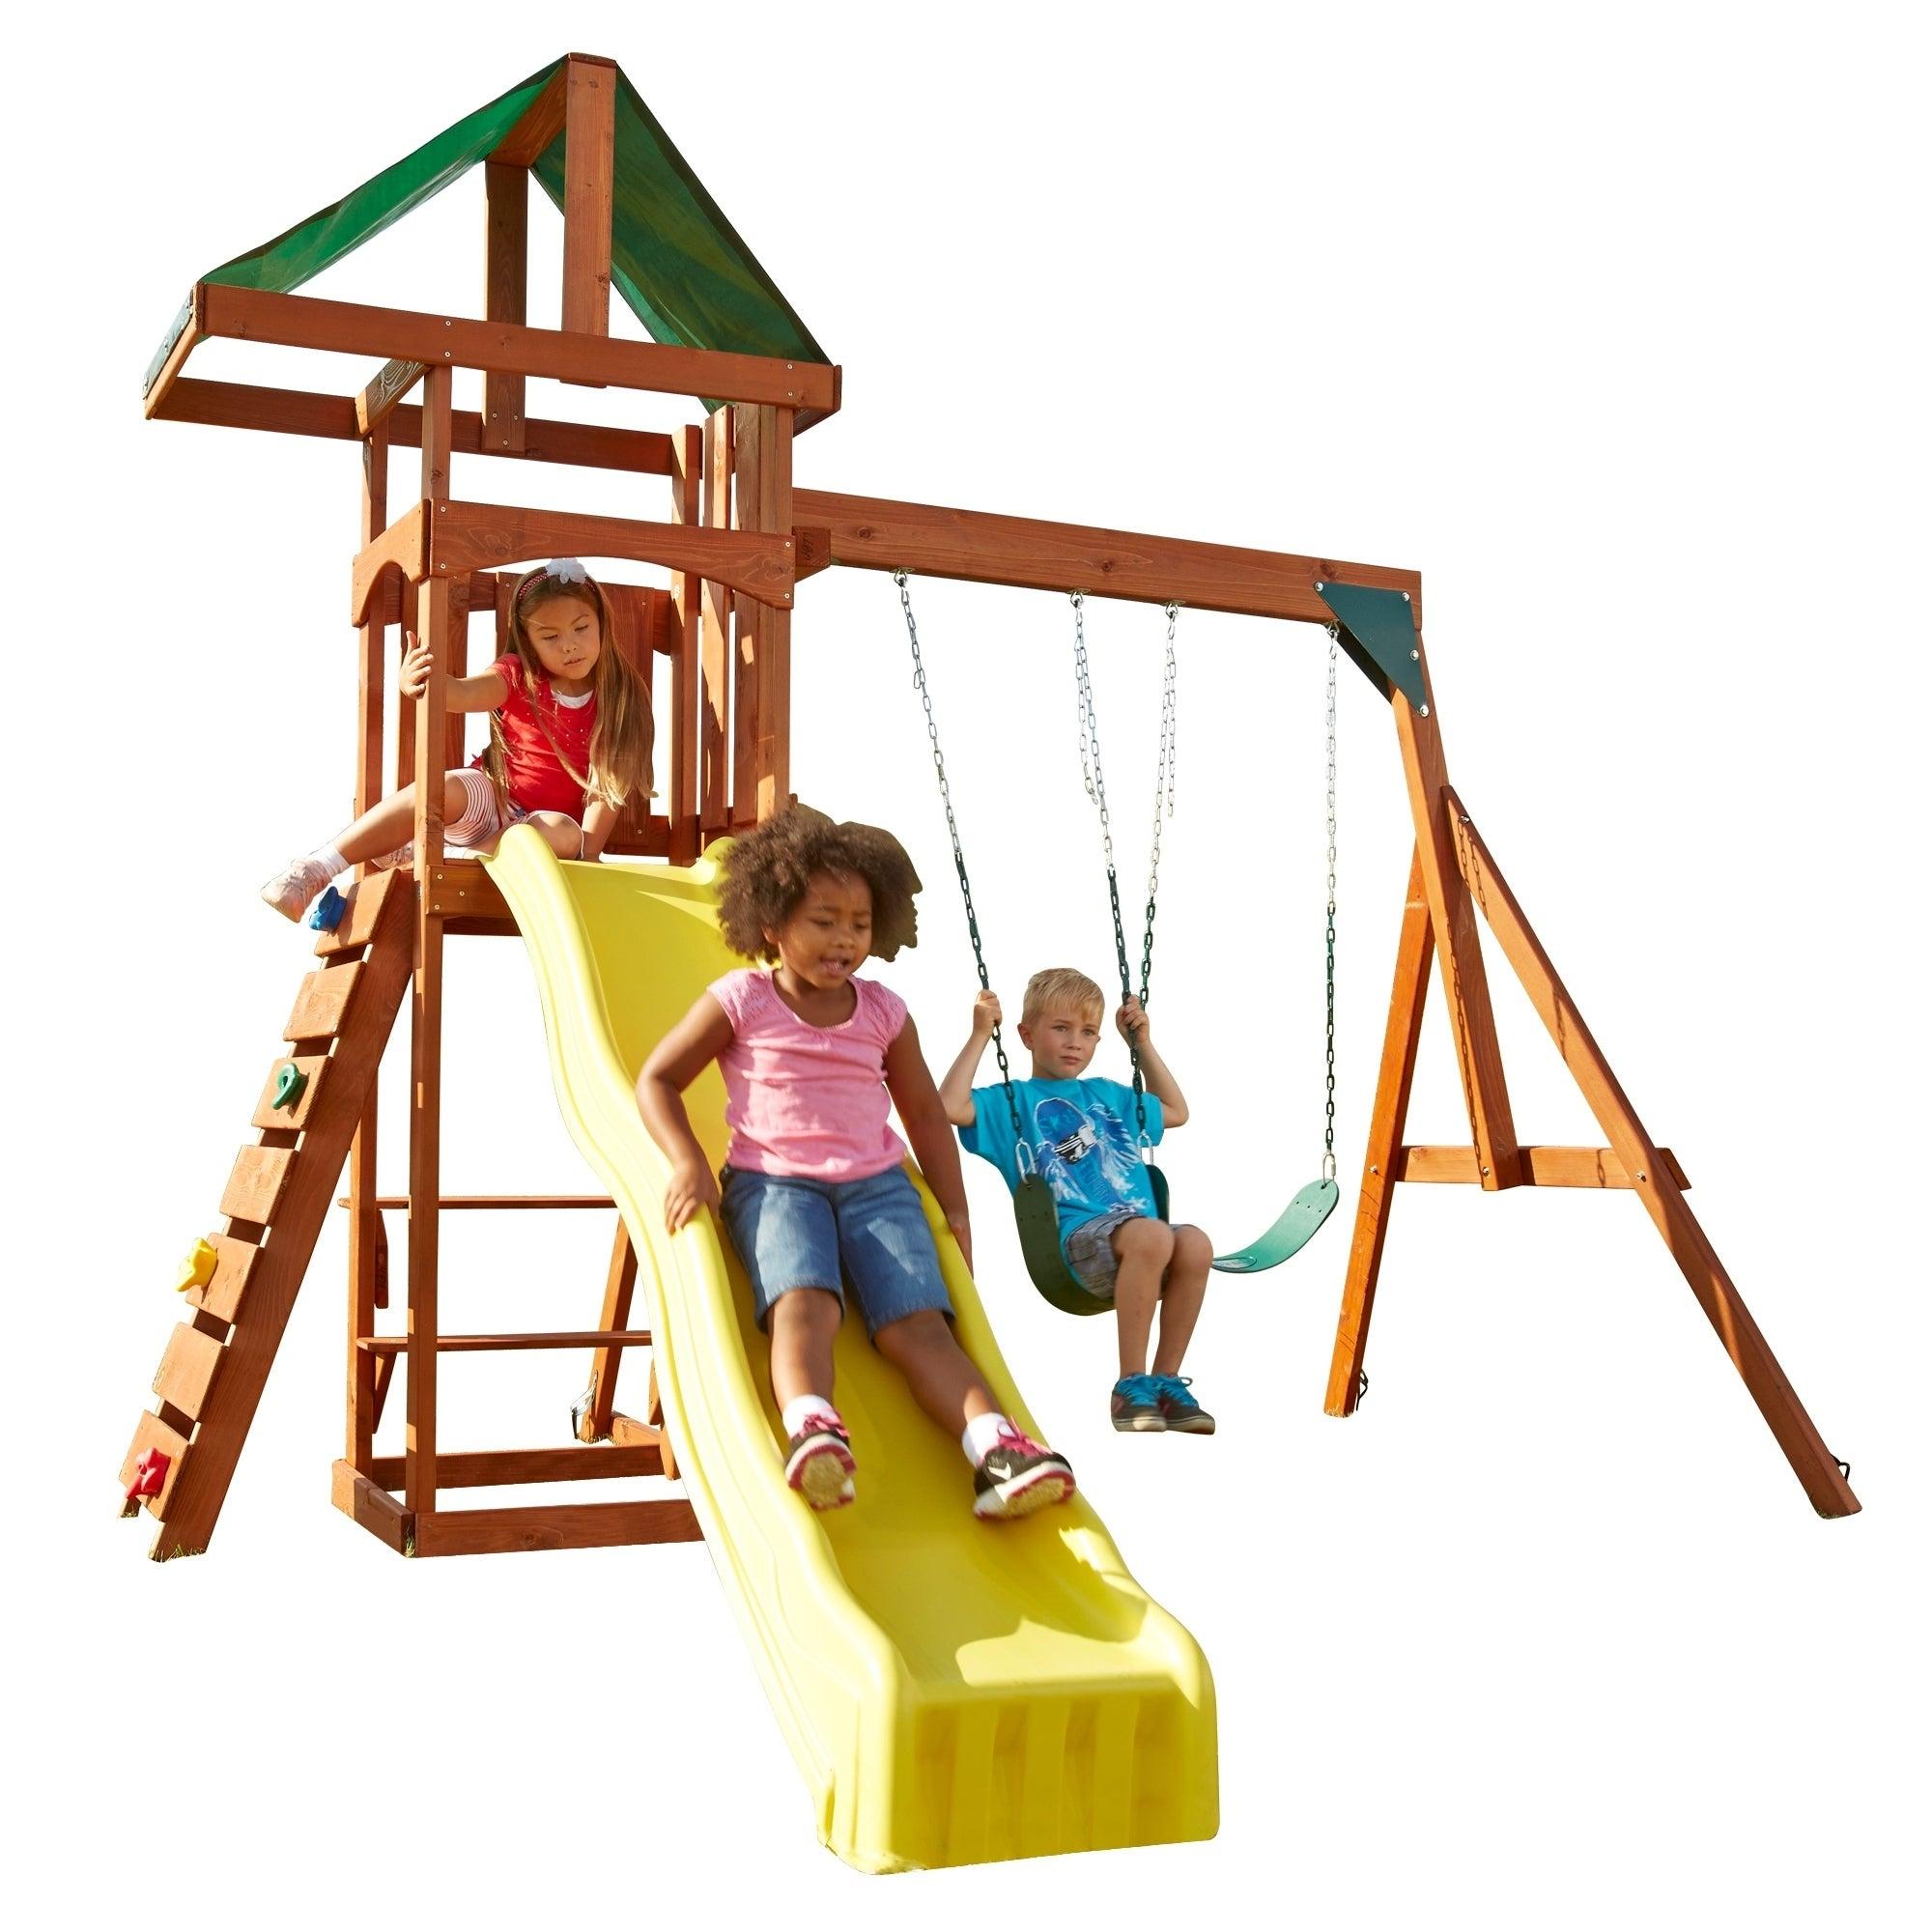 Swing-N-Slide Scrambler Swing Set at Sears.com